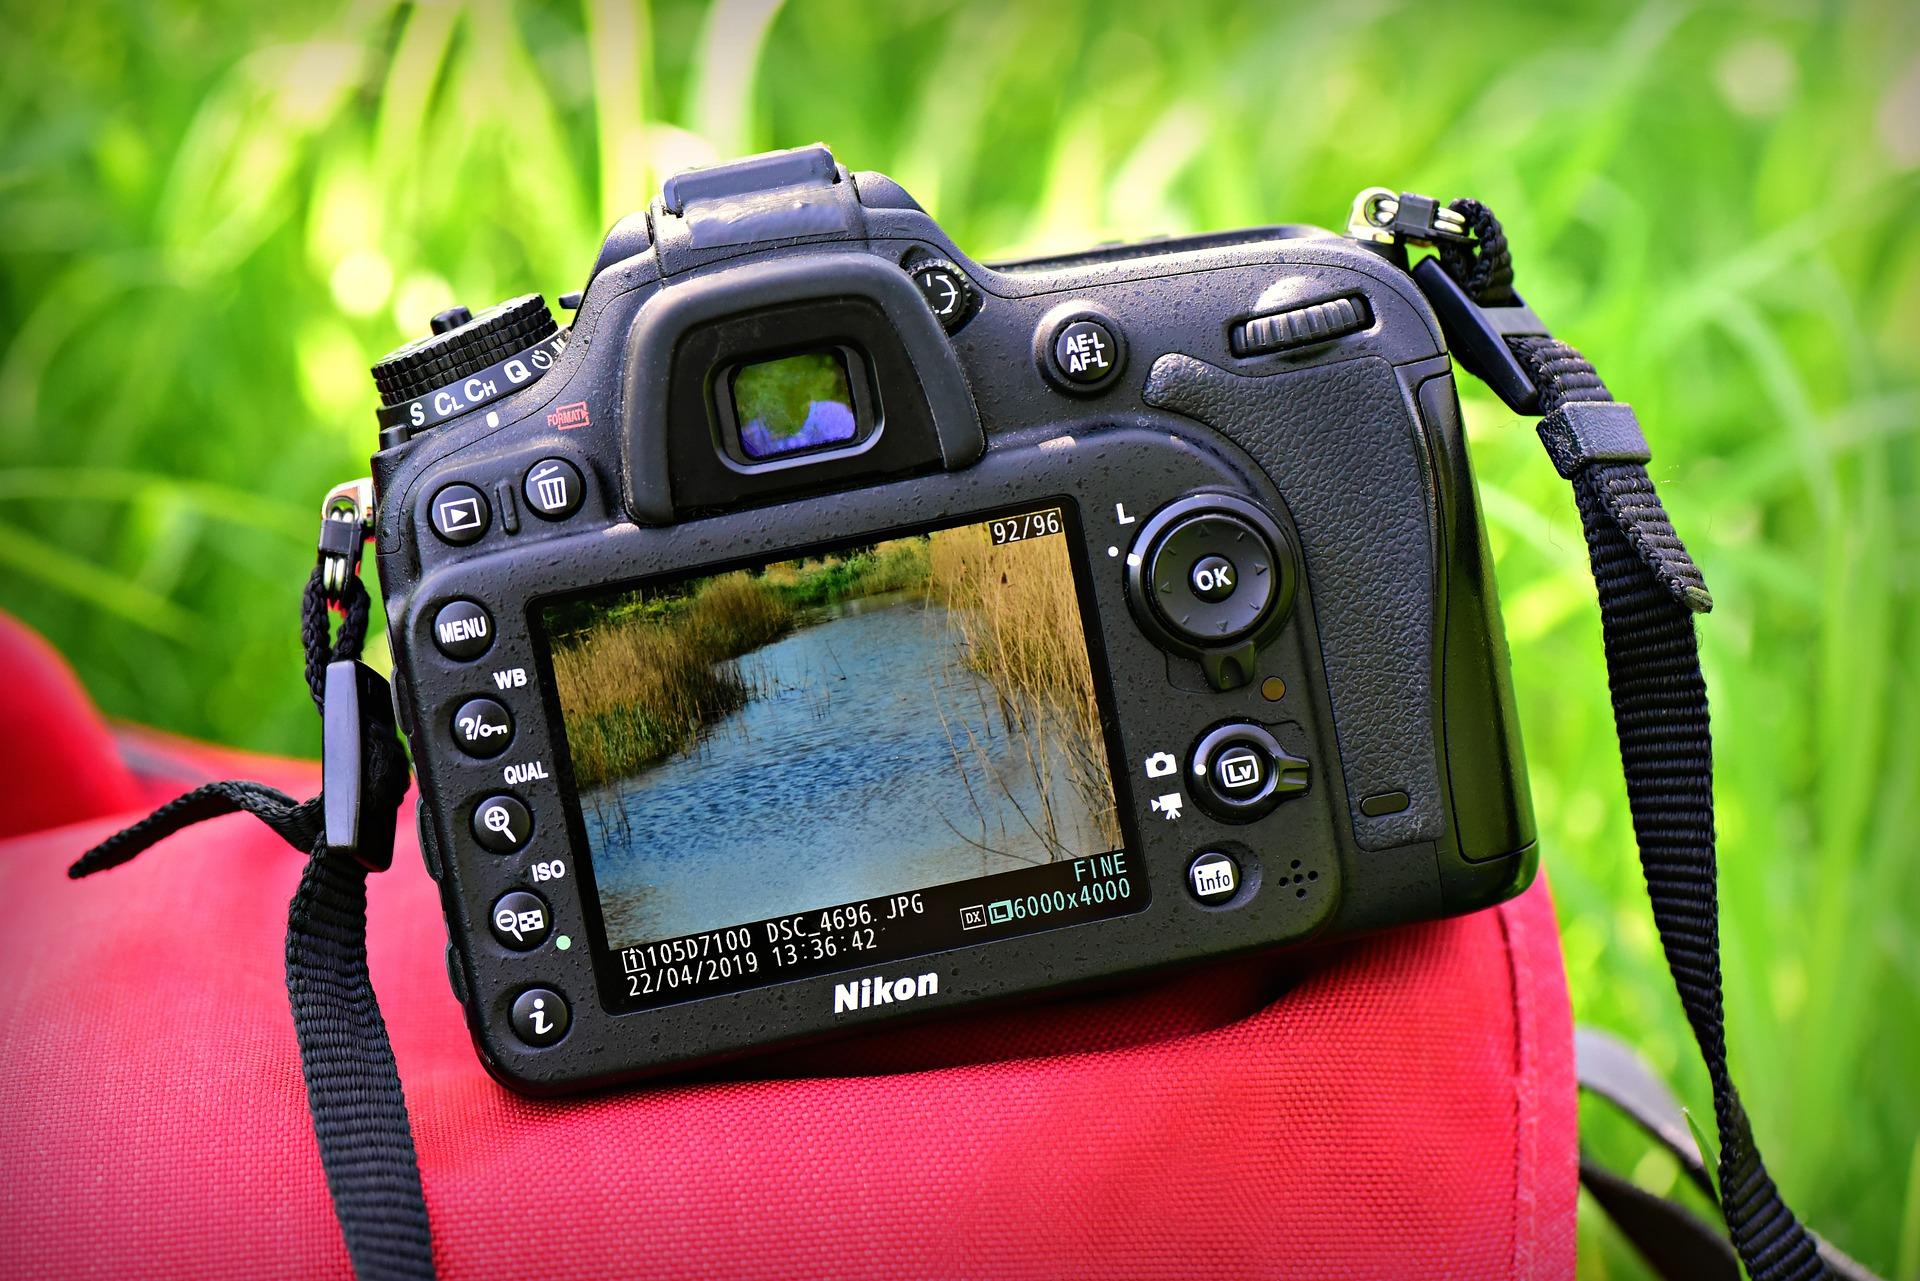 Kilka słów o Nikon D7100